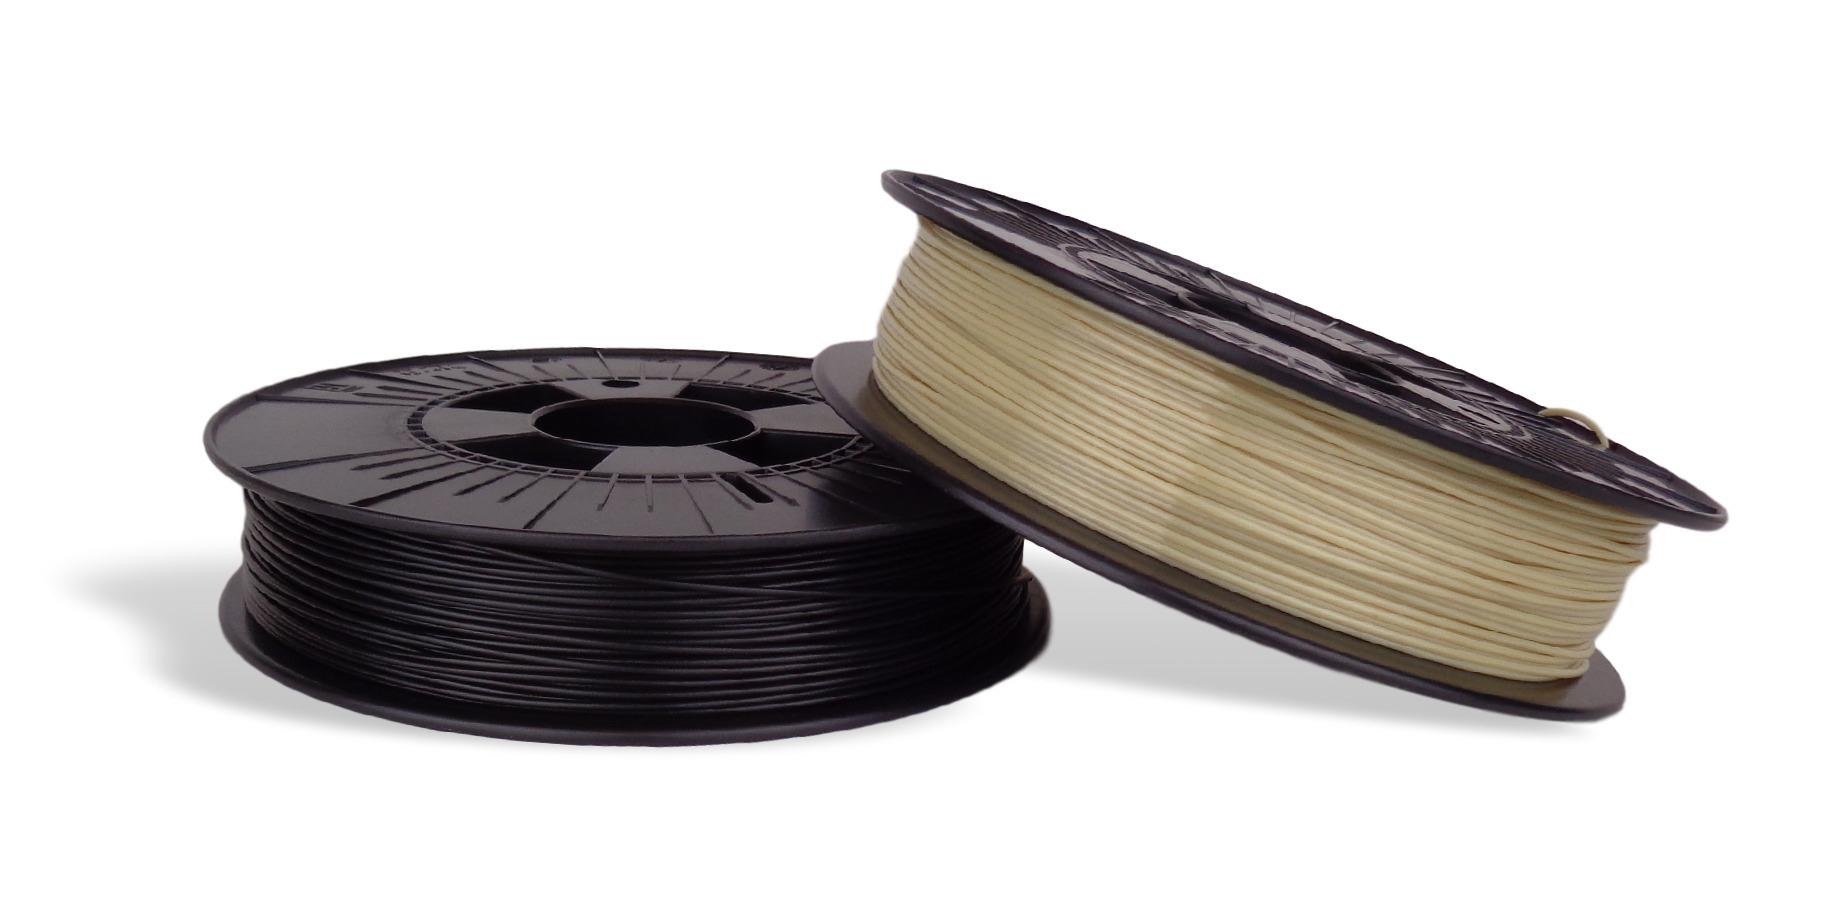 ultem-1010-9085-filament.jpg